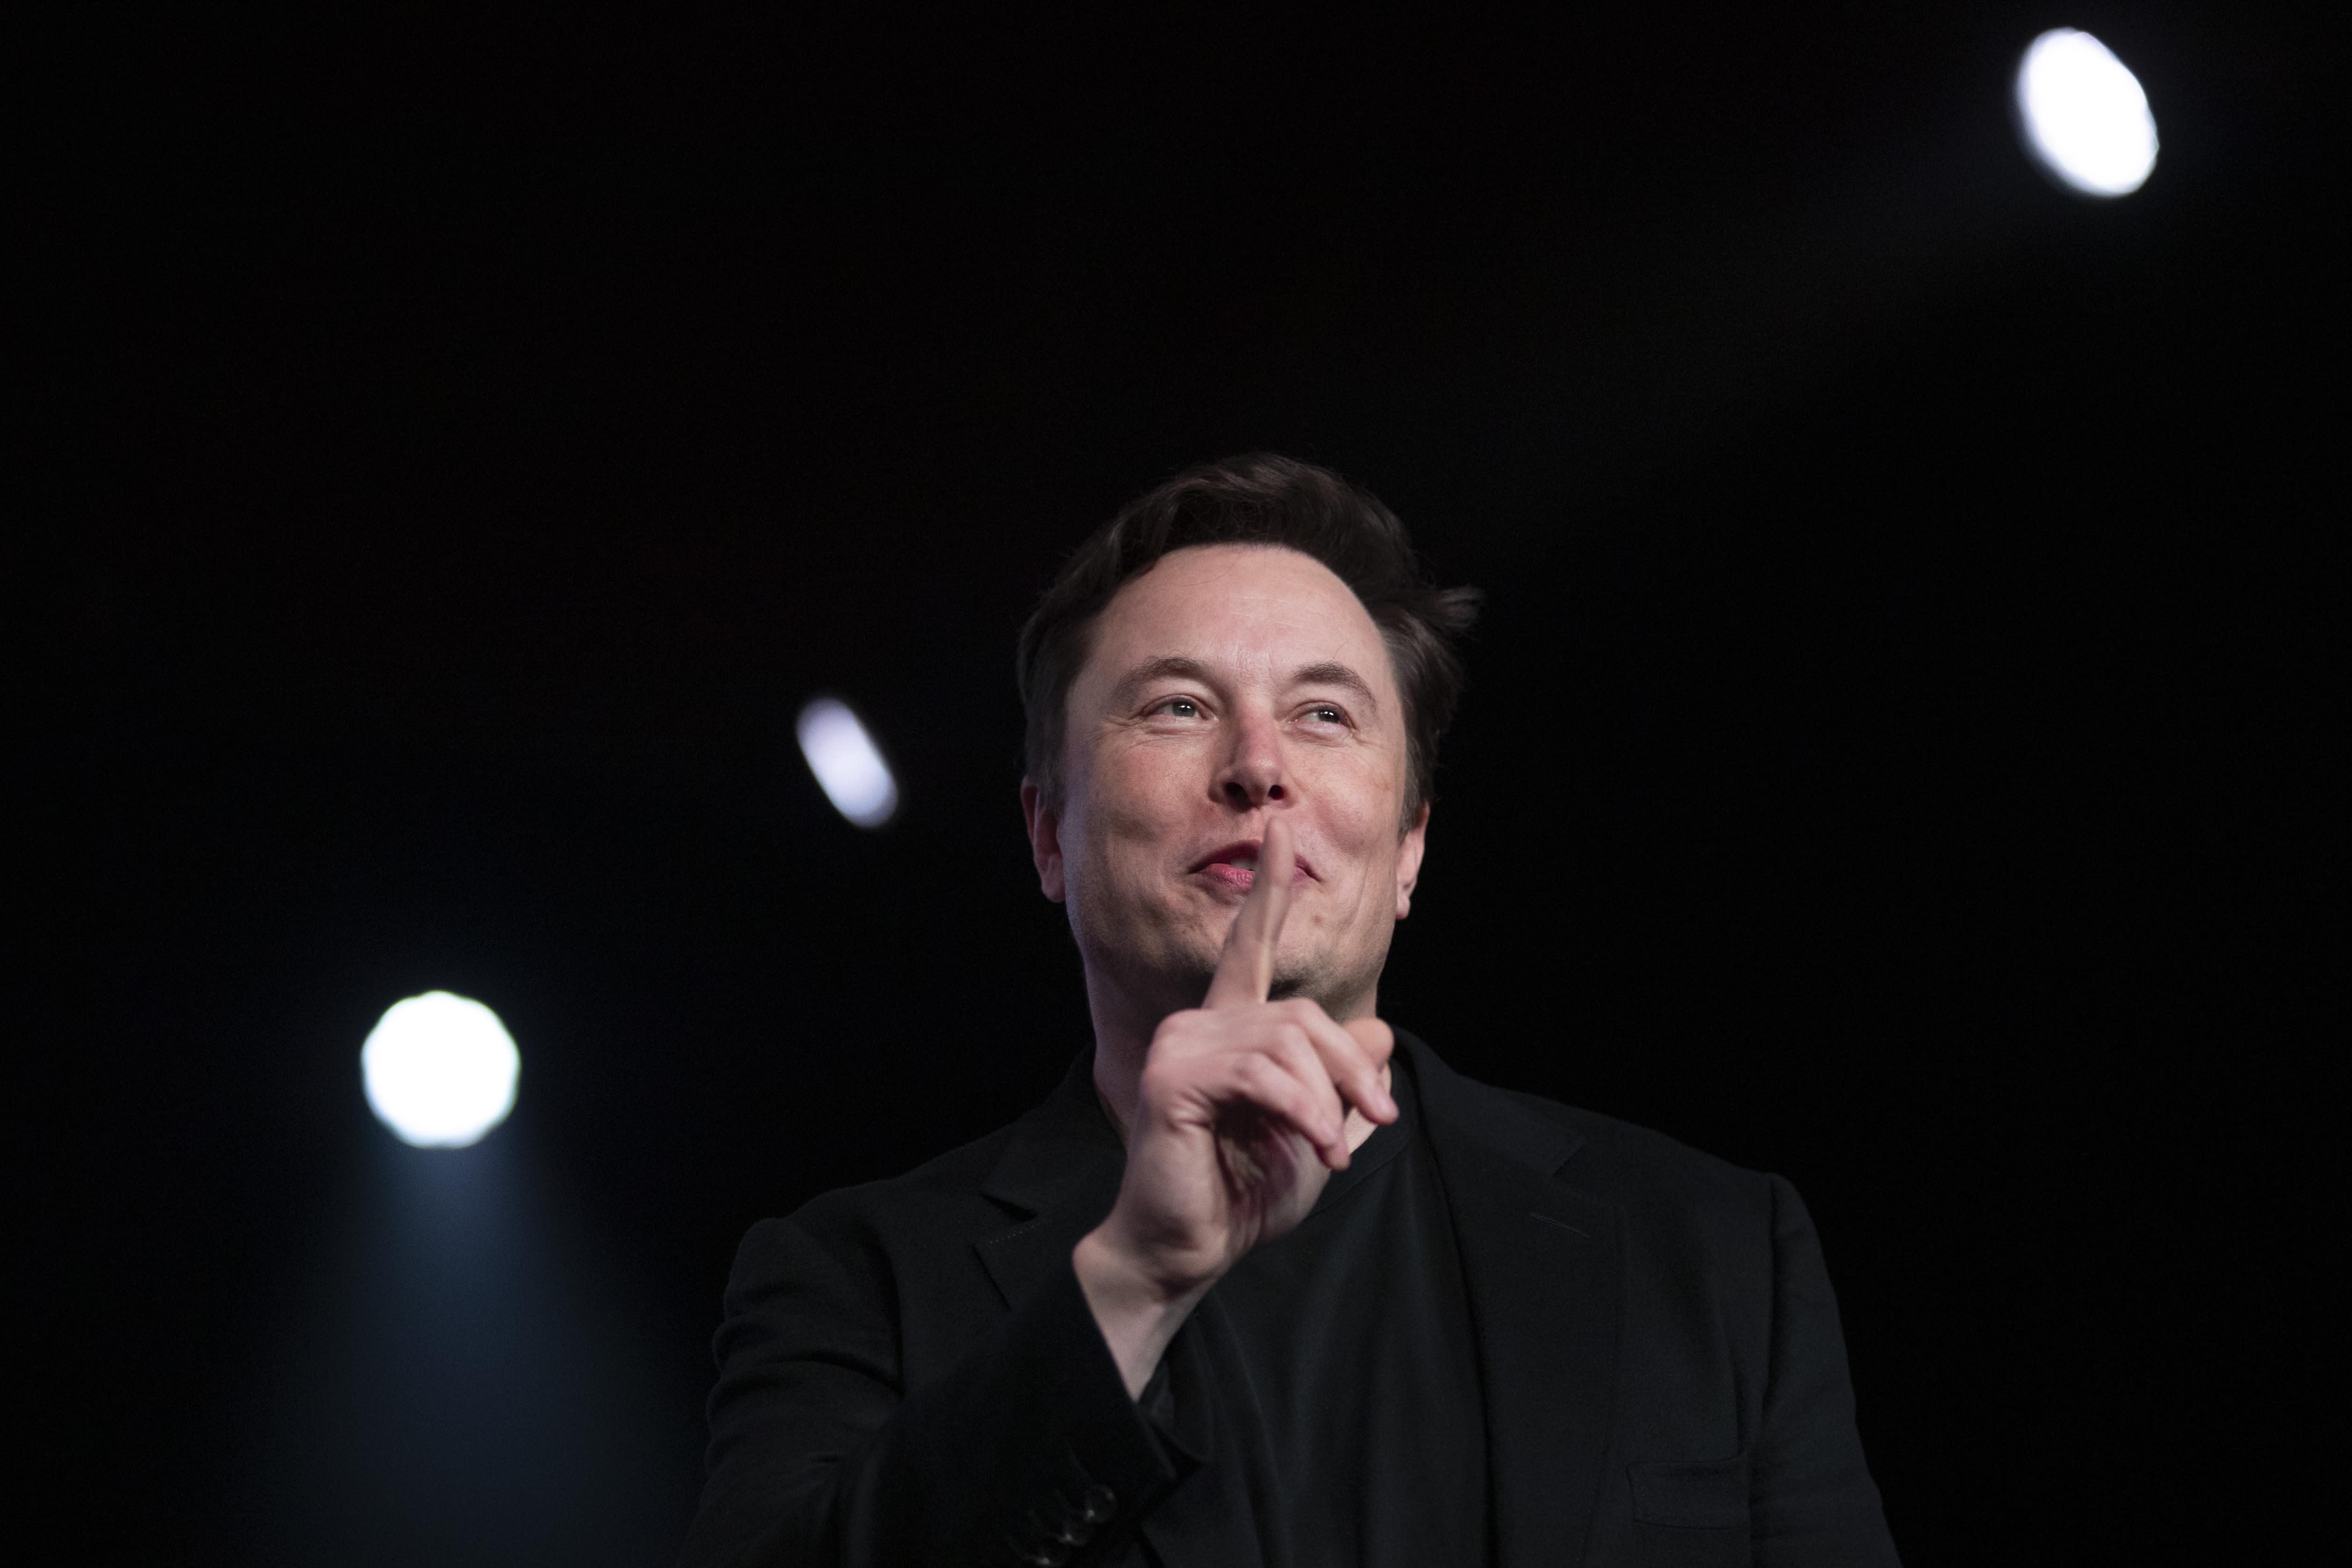 Tesla bull Dan Ives calls Q1 earnings one of the 'top debacles' and downgrades stock